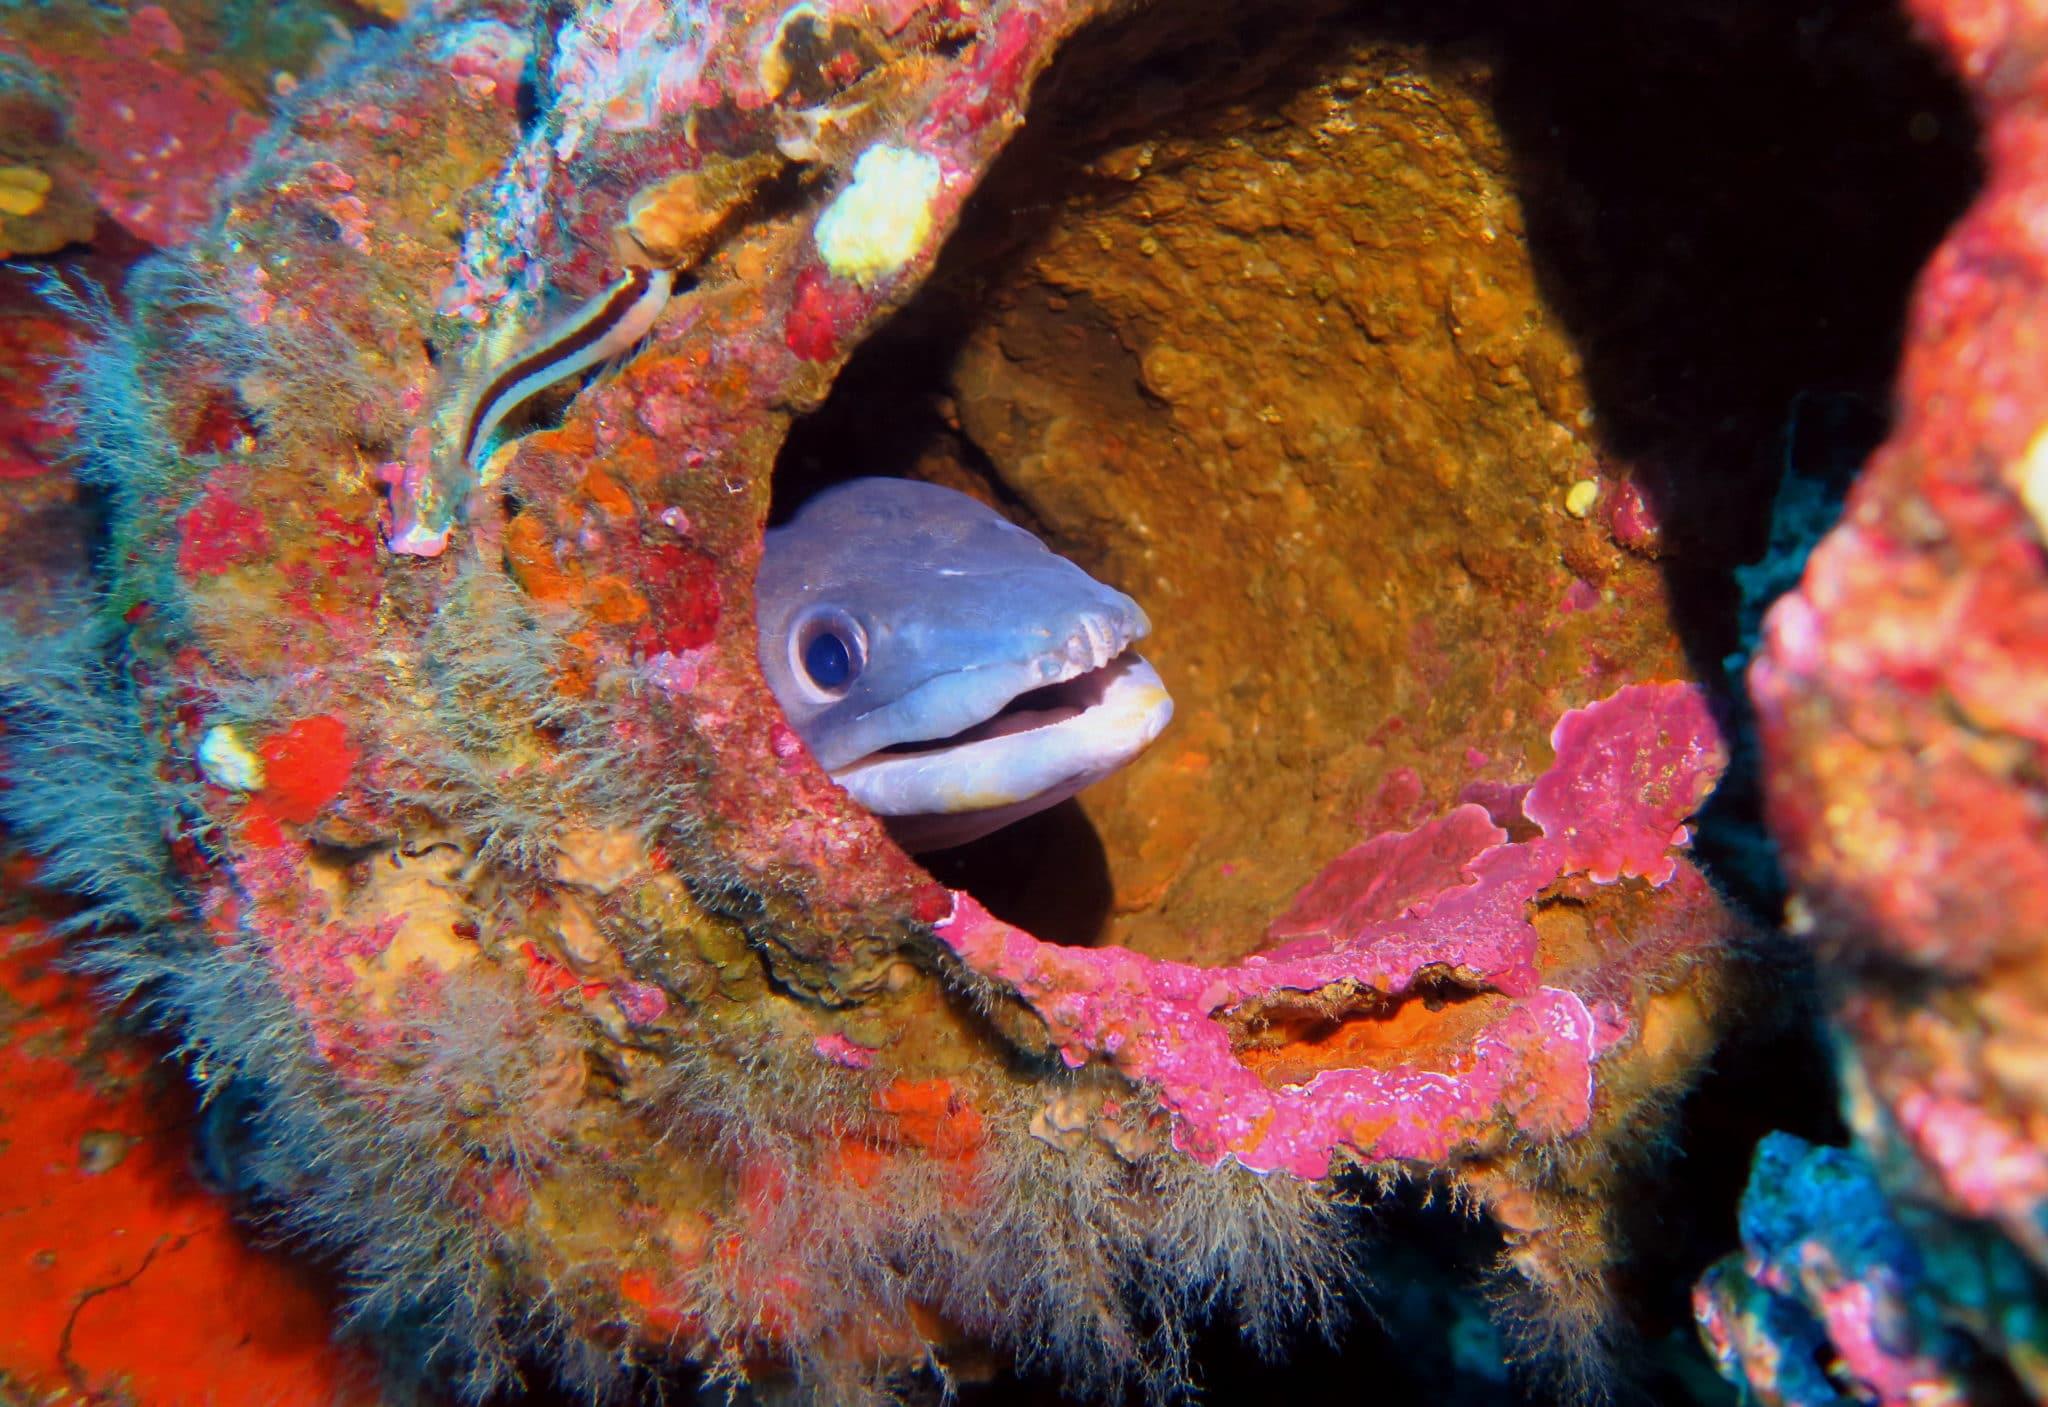 Conger Le Rubis submarine wreck dive Cavalaire France